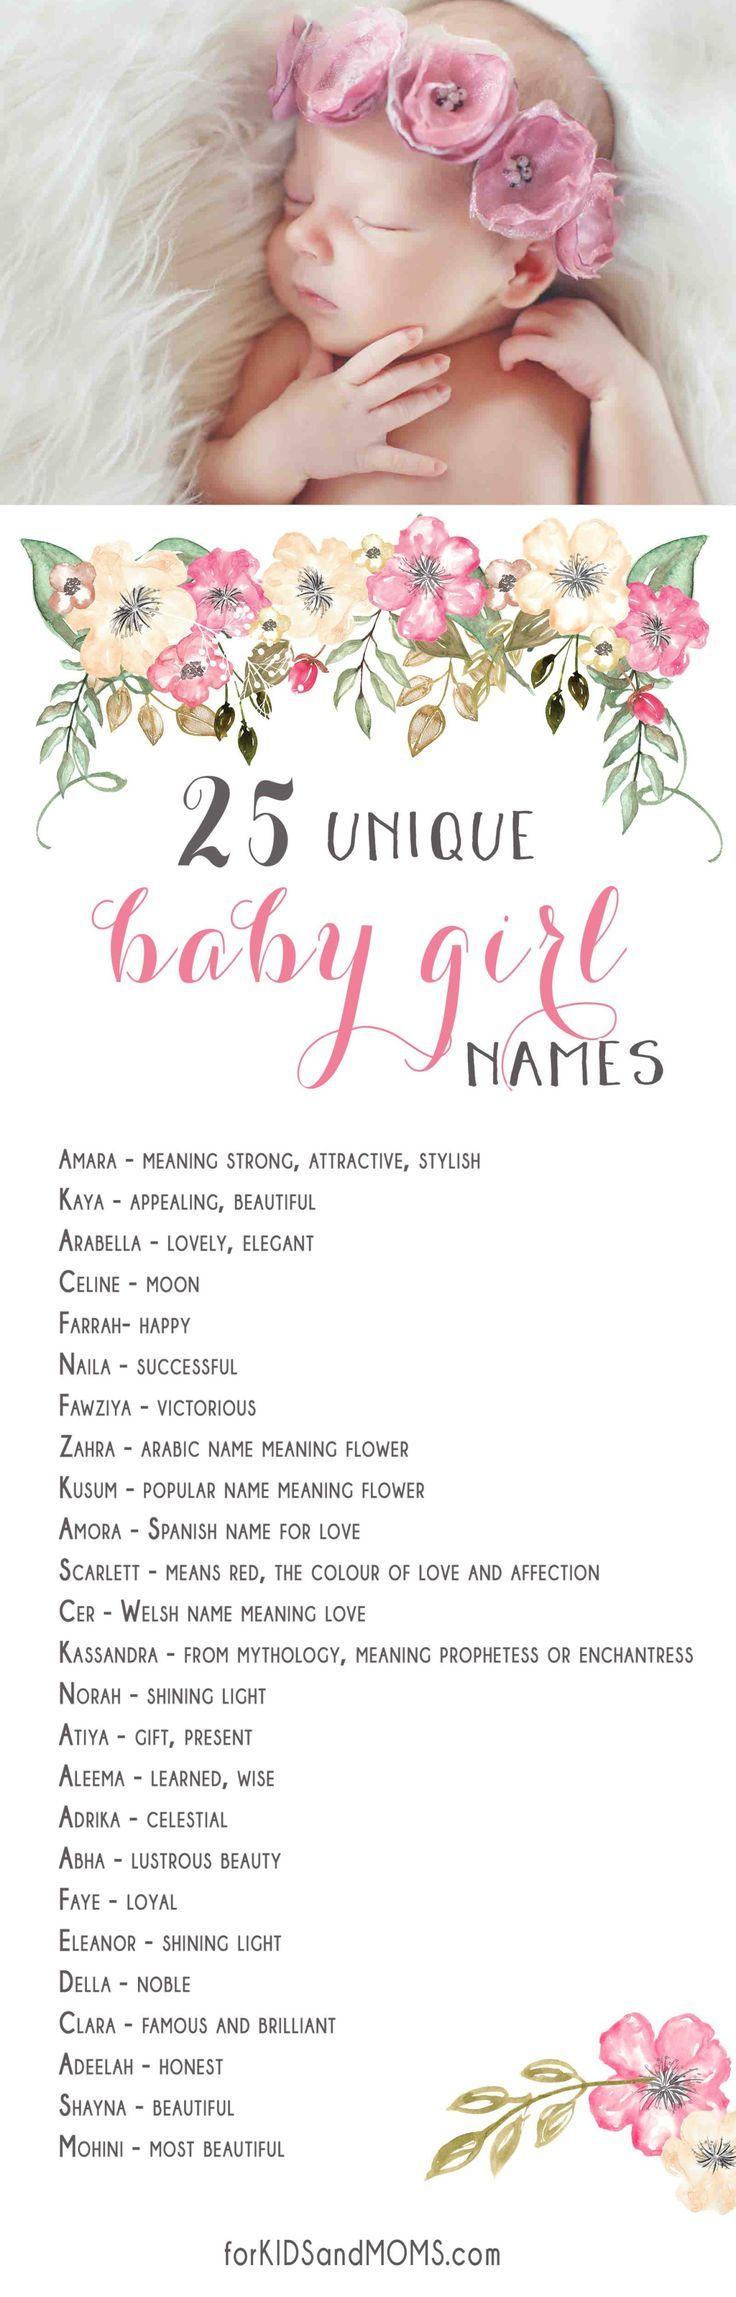 Baby Girl Names That Start With L Unique Kuvat Kritische Theorie